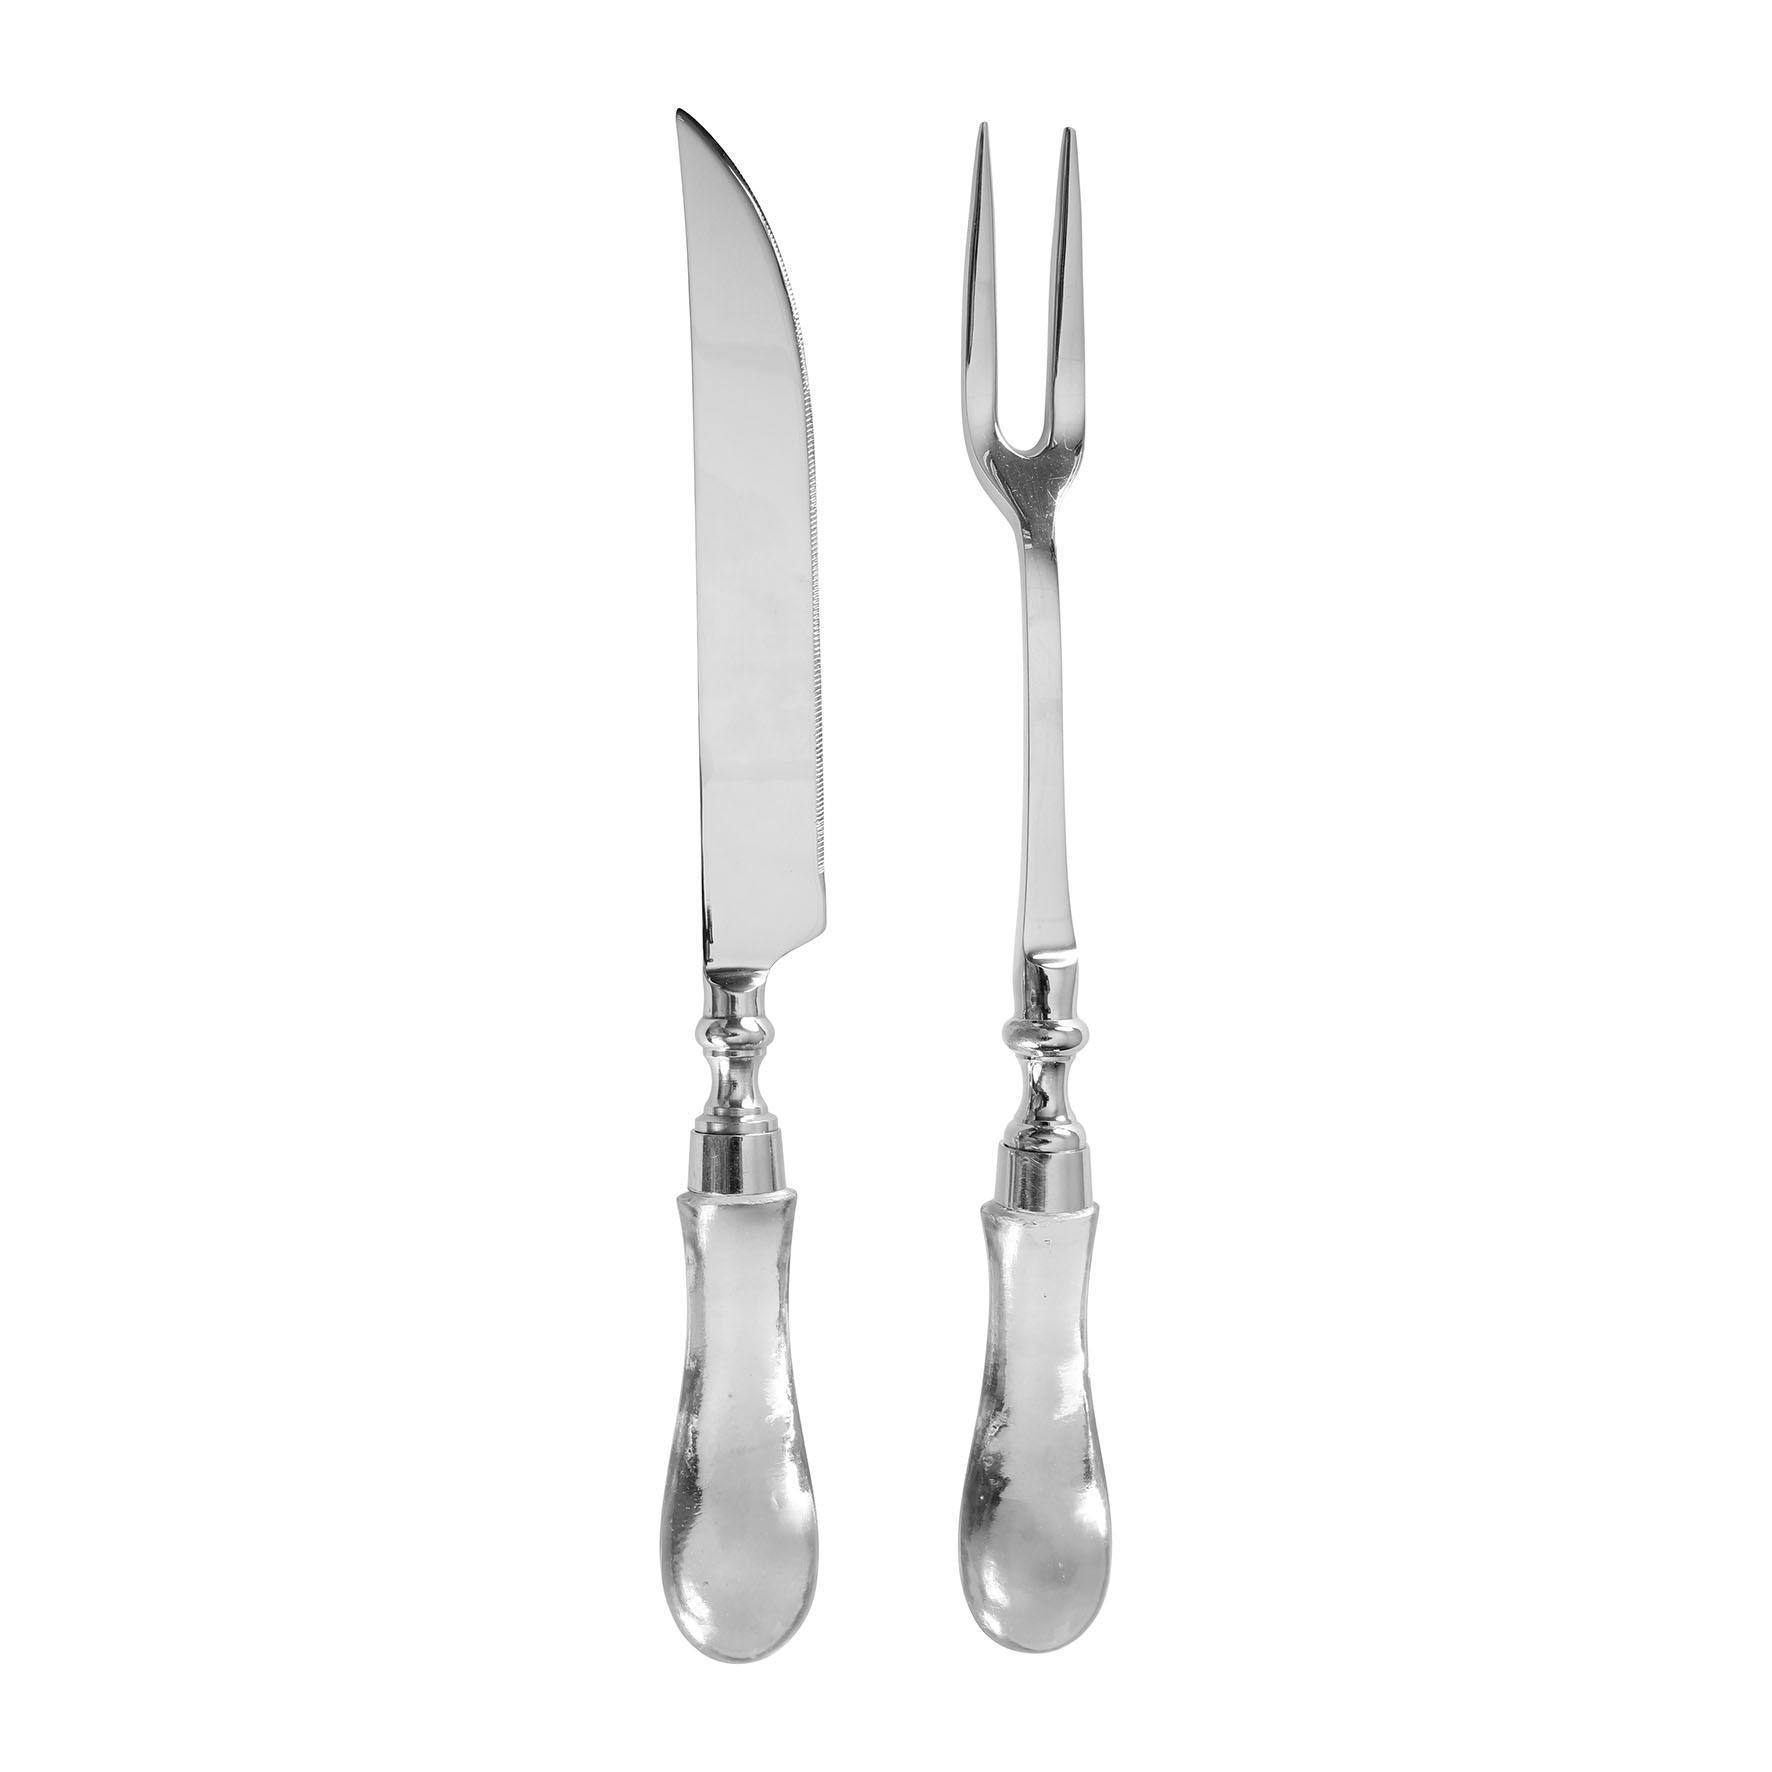 CÔTÉ TABLE Sada na grilování - vidlička a nůž Clear, stříbrná barva, čirá barva, sklo, kov